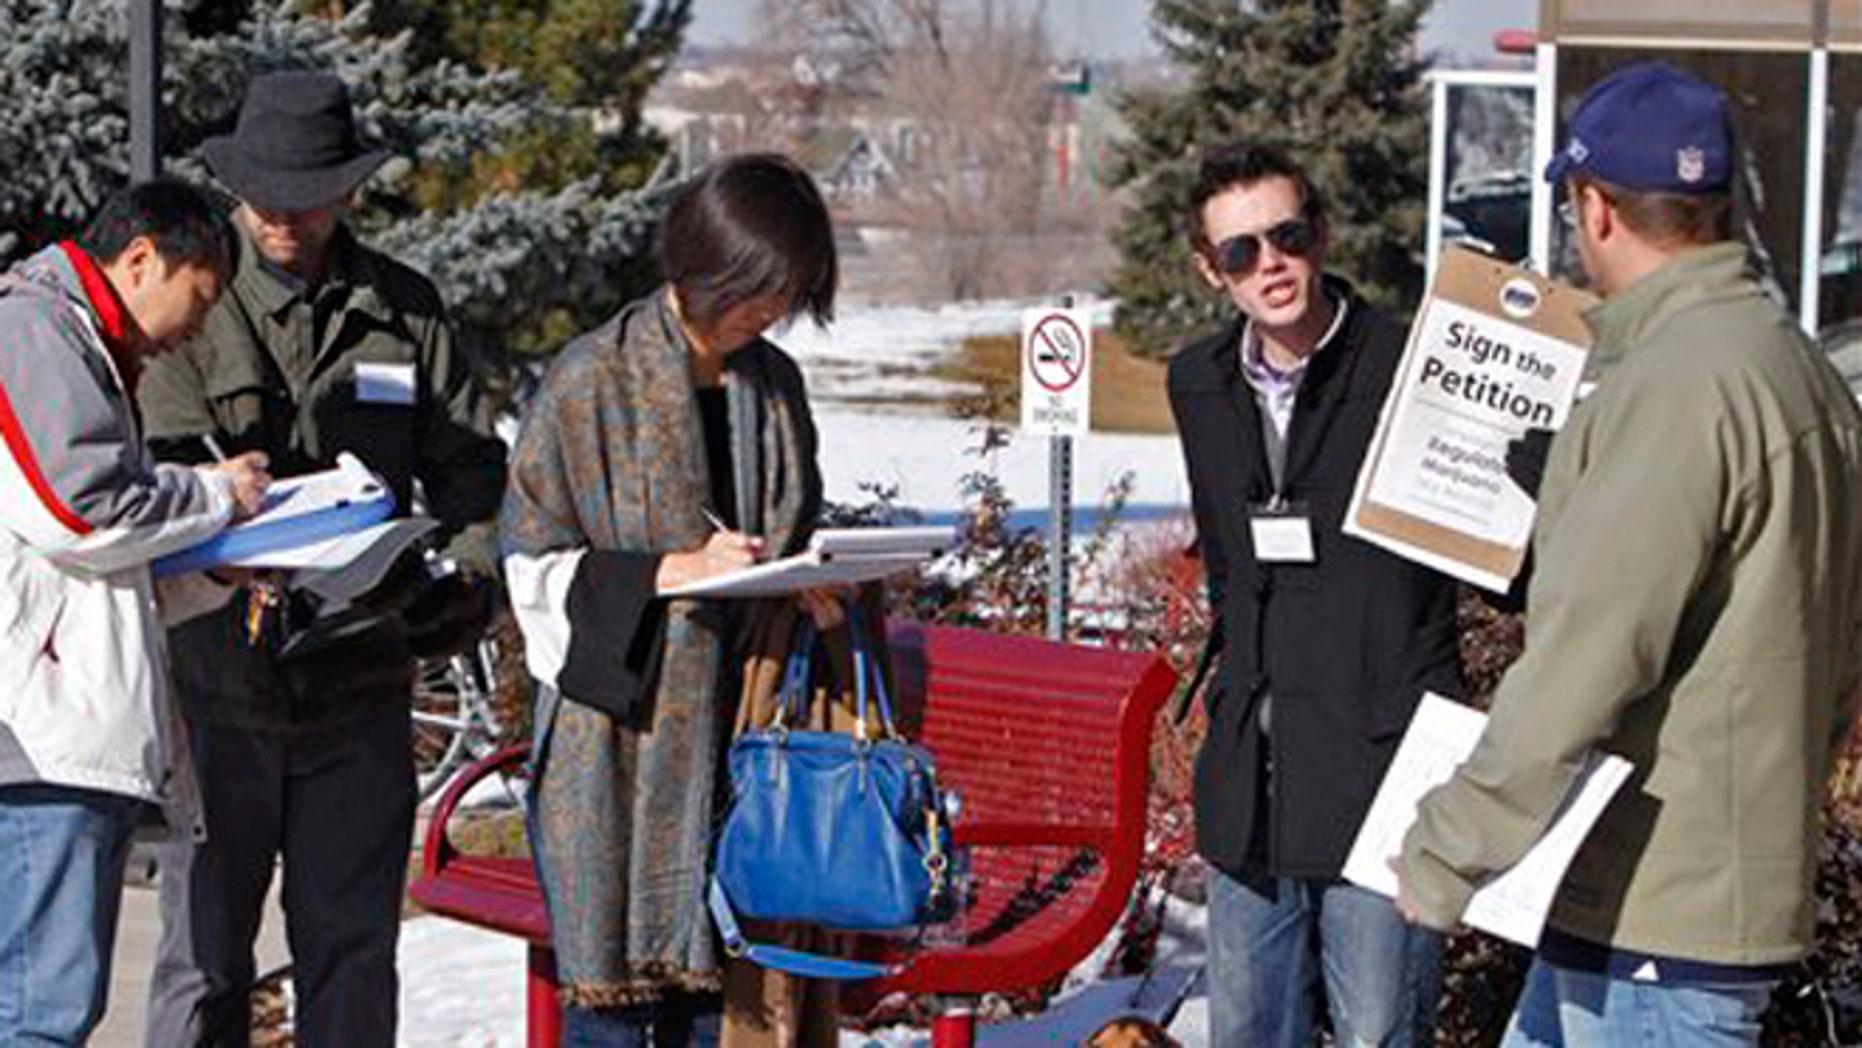 FILE: Dec. 8, 2011: Volunteers  collect signatures on a petition to legalize marijuana in Colorado.